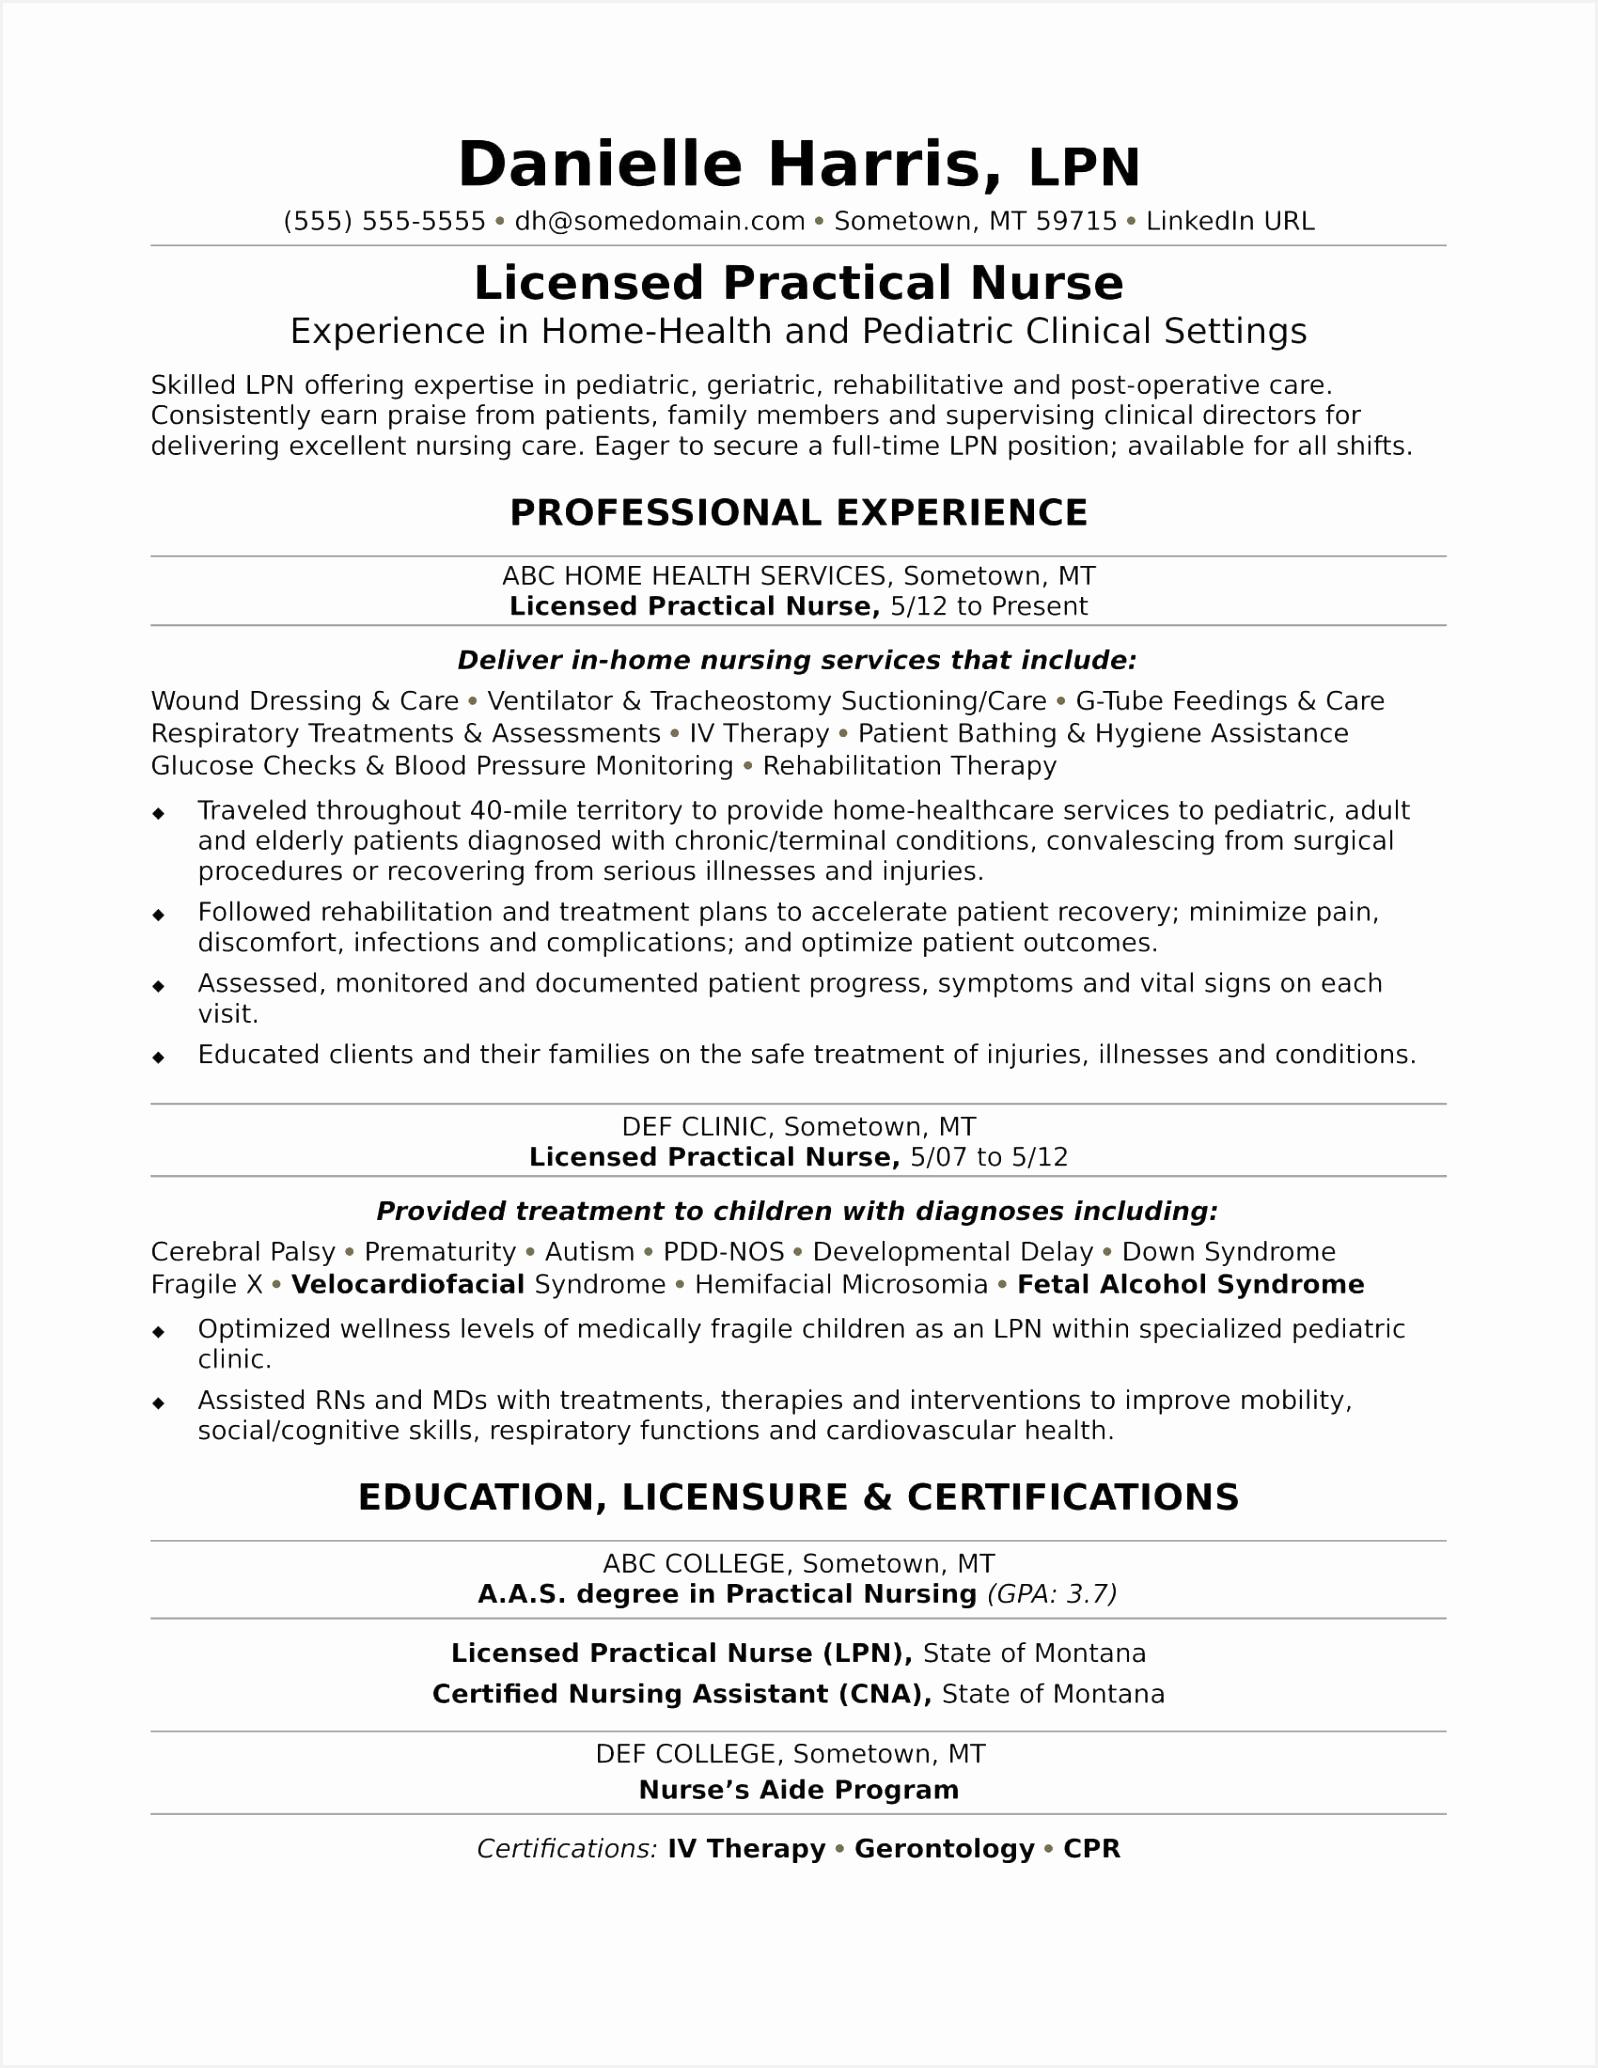 References On Resume Examples Gke3g Elegant Resume References Valid References Resume Unique Insurance Resumes Of 8 References On Resume Examples